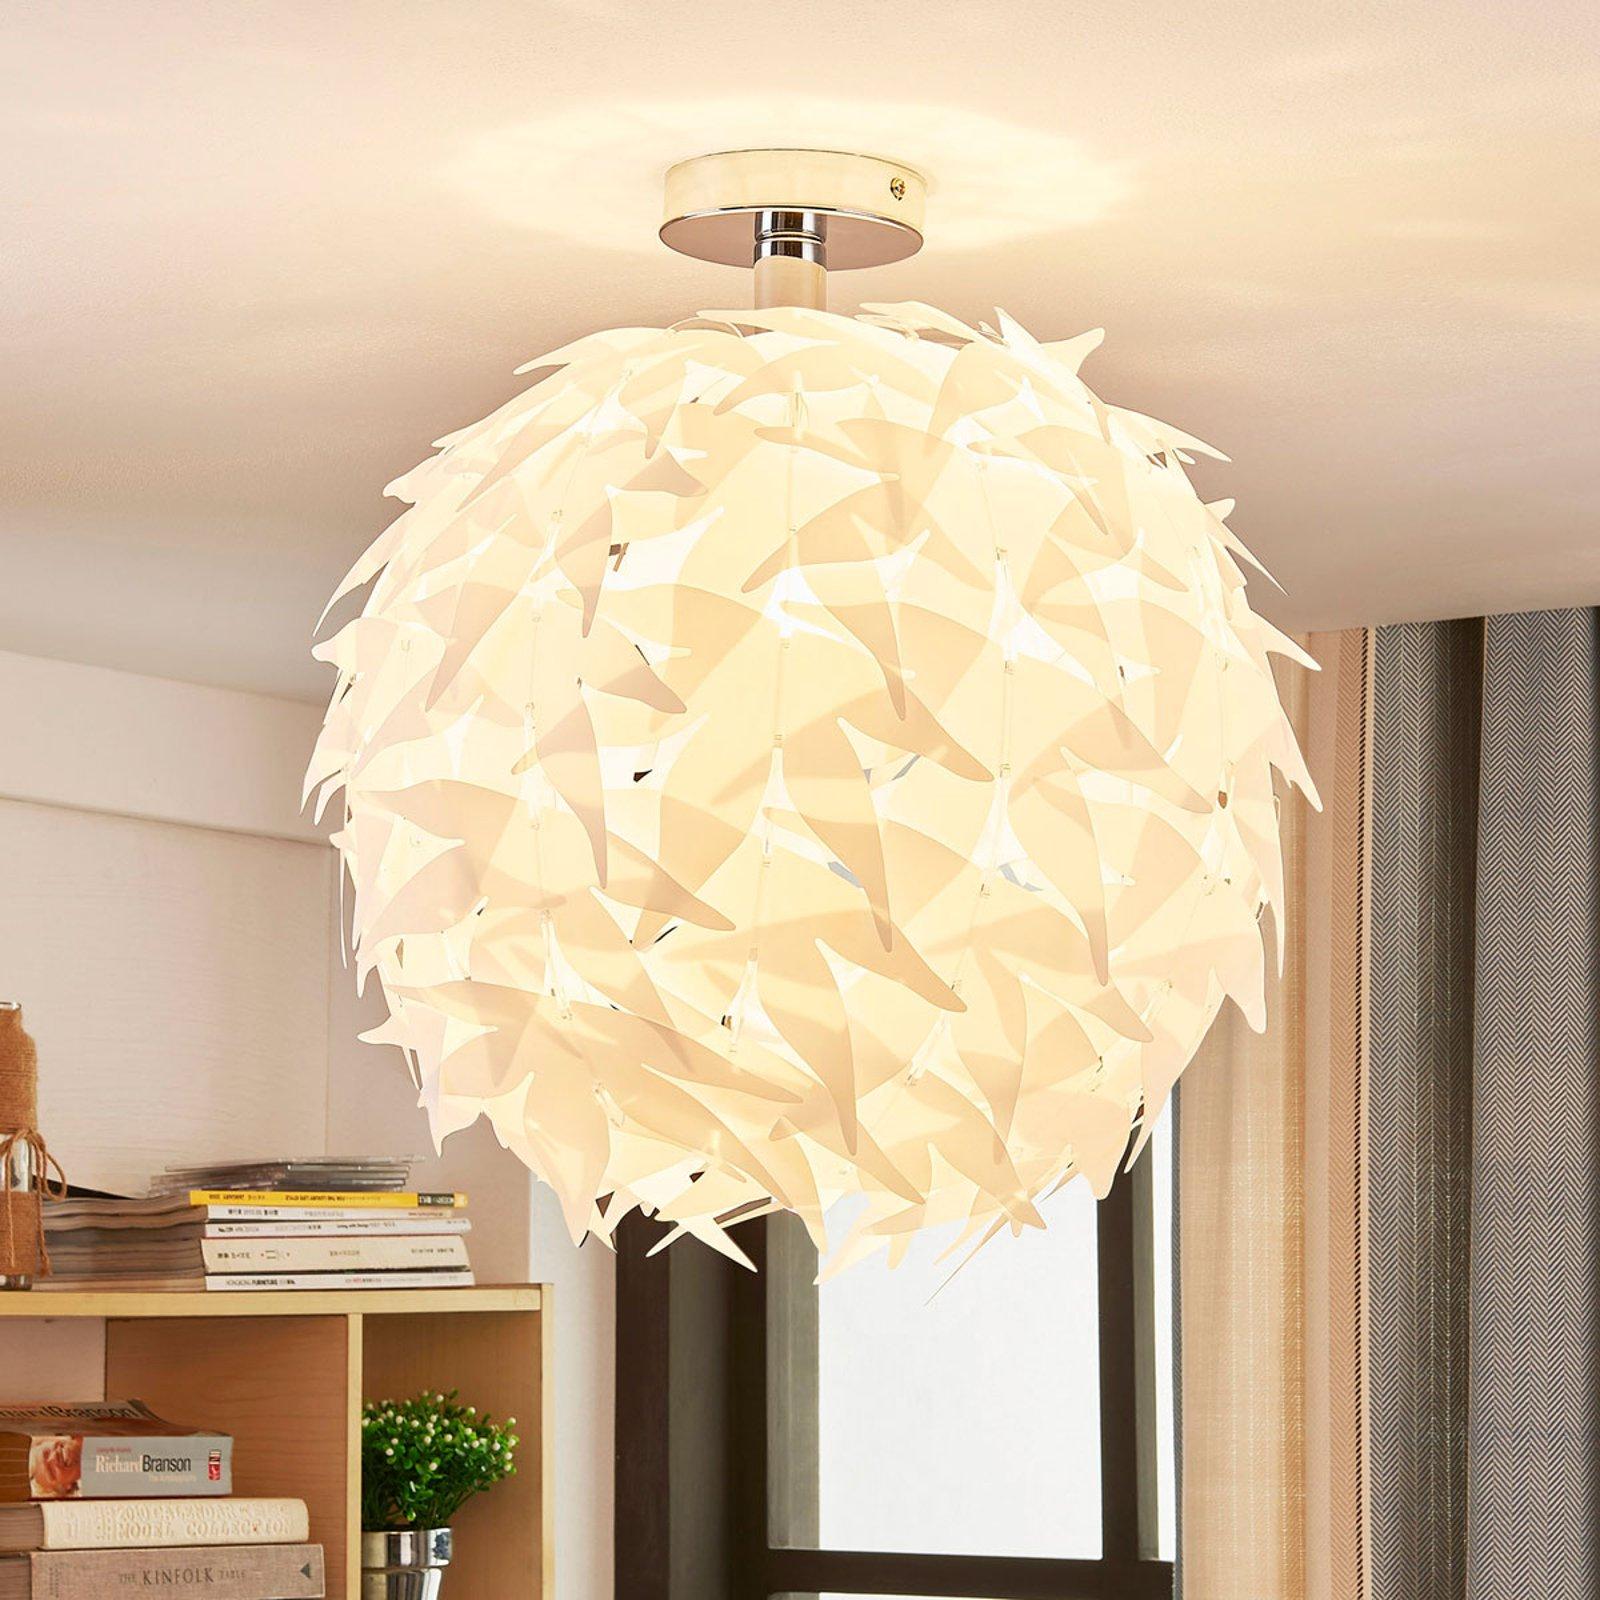 Corin - hvit taklampe i trendy look.